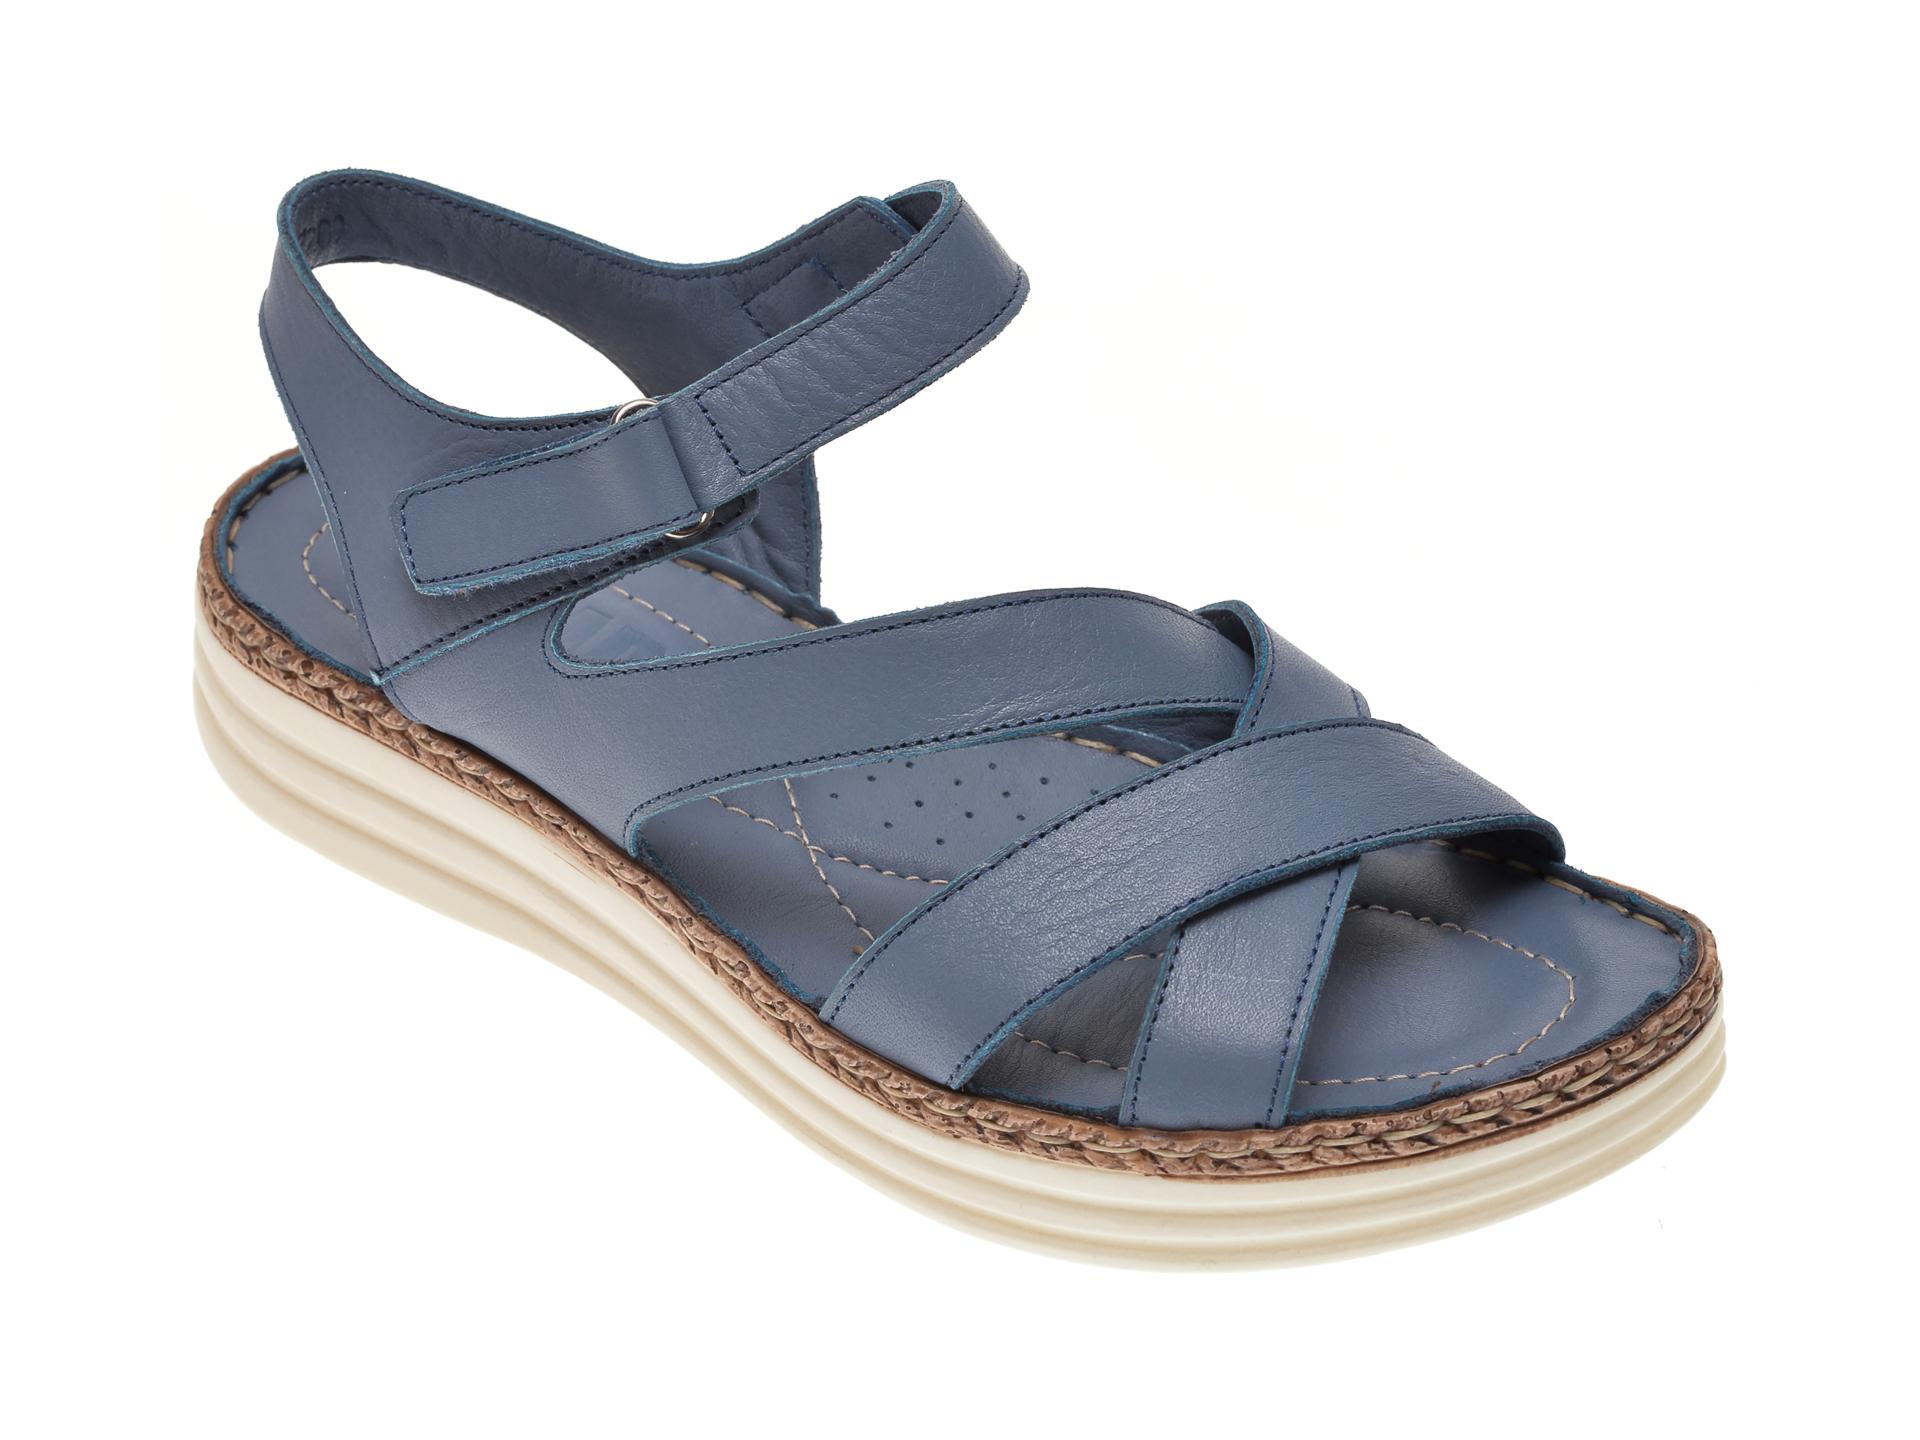 Sandale ON THE ROAD albastre, 543, din piele naturala